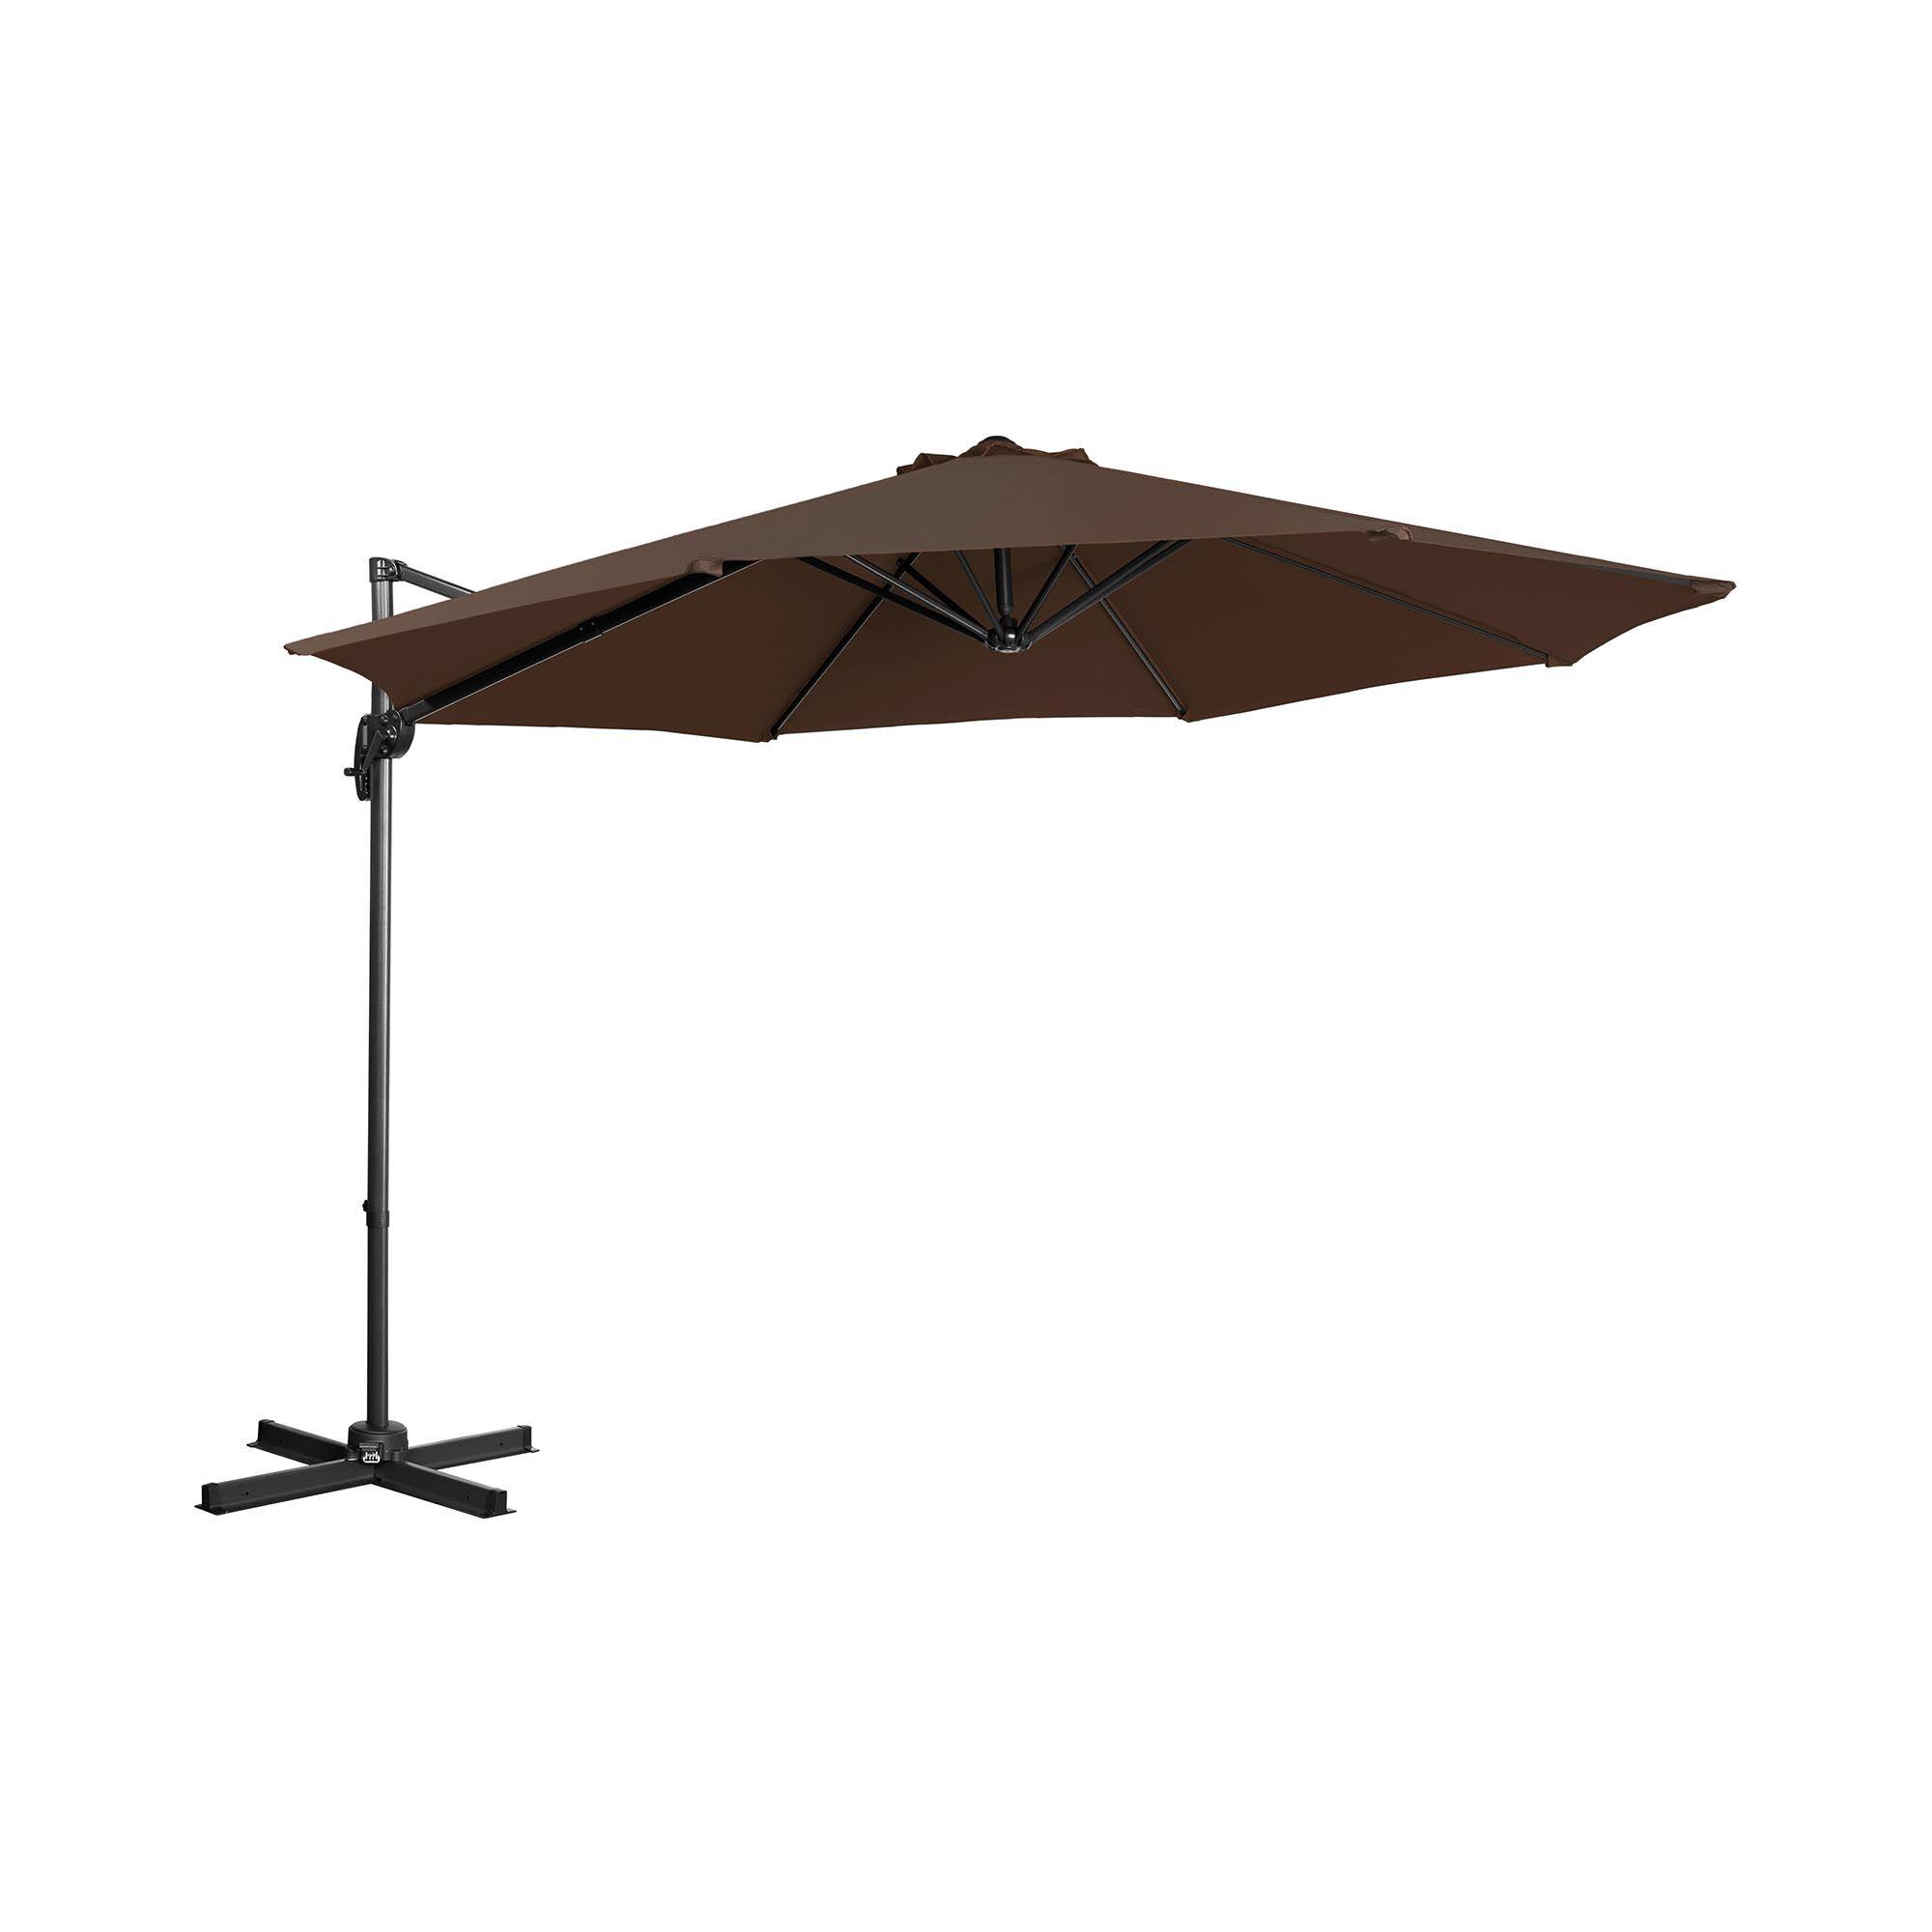 Uniprodo Hanging Parasol - brown - round - Ã 300 cm - rotatable